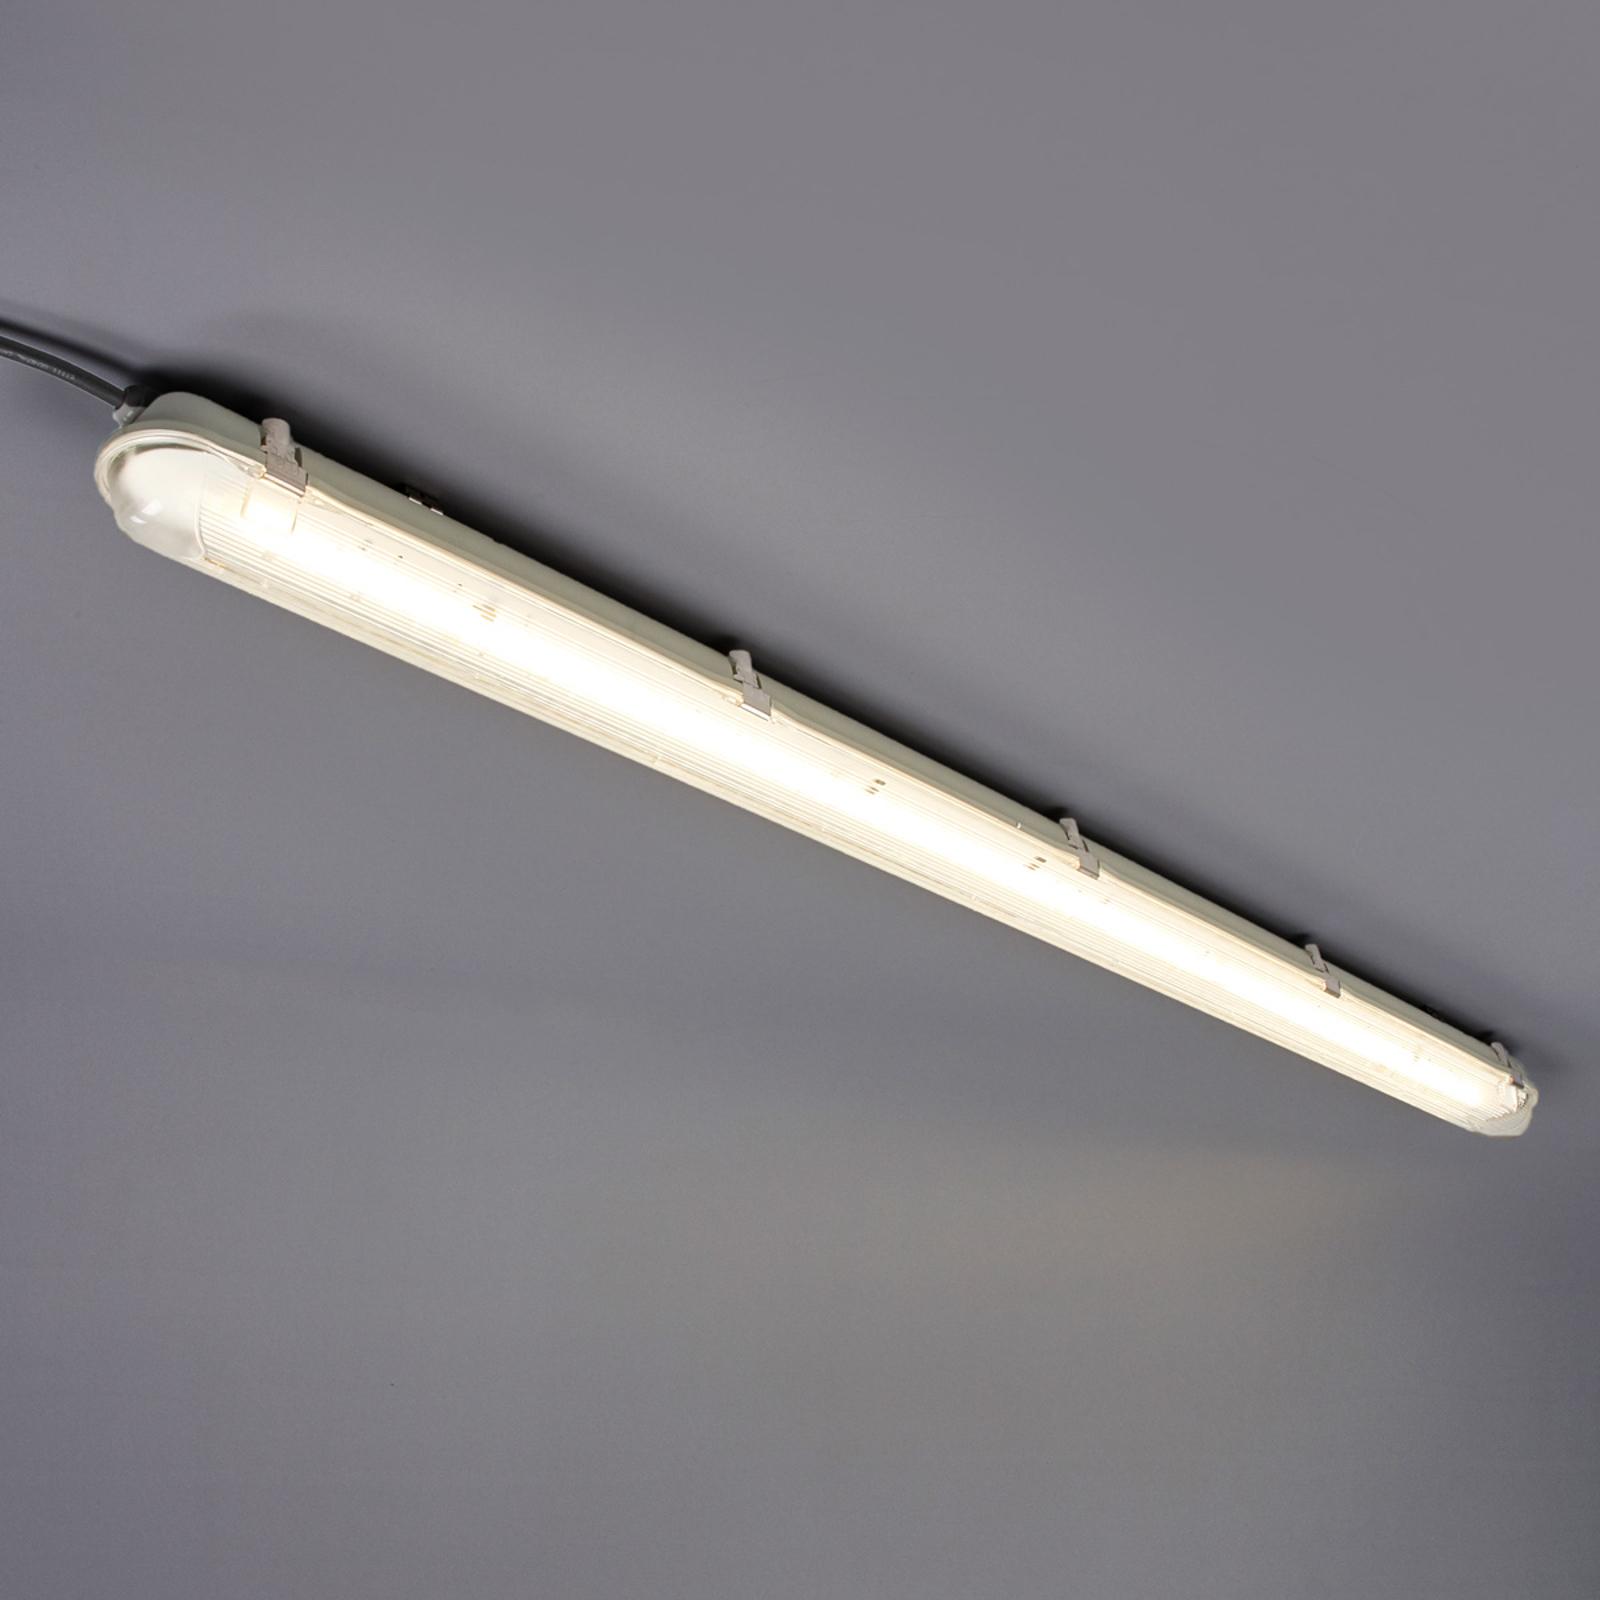 LED-påbygningsarmatur til vådrum, 34 W